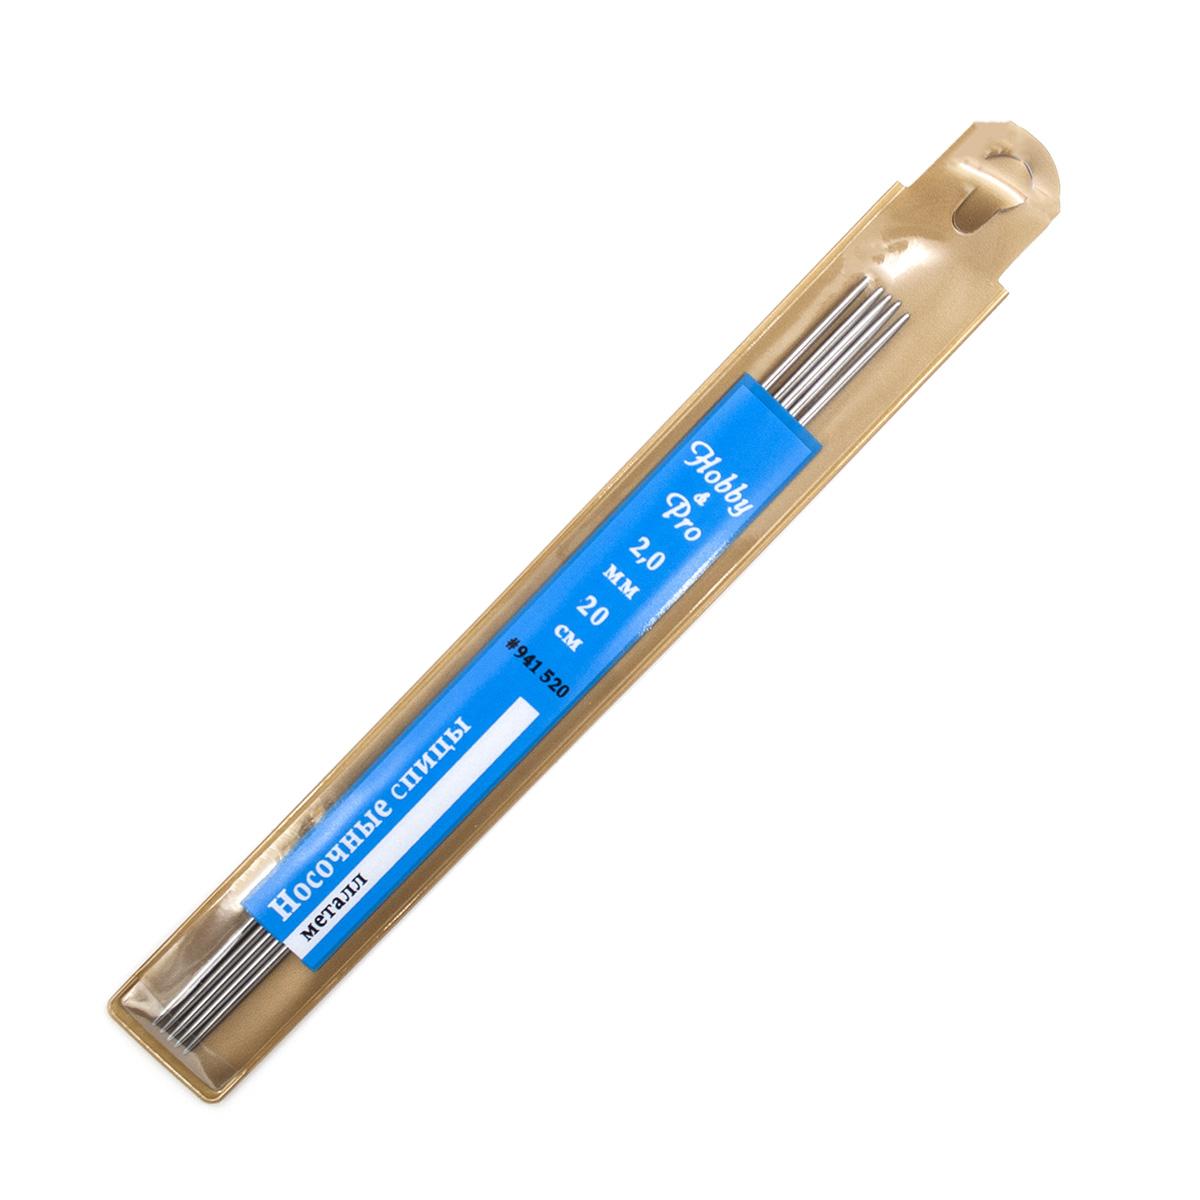 941520 Спицы носочные металл 20см, 2,0мм Hobby&Pro